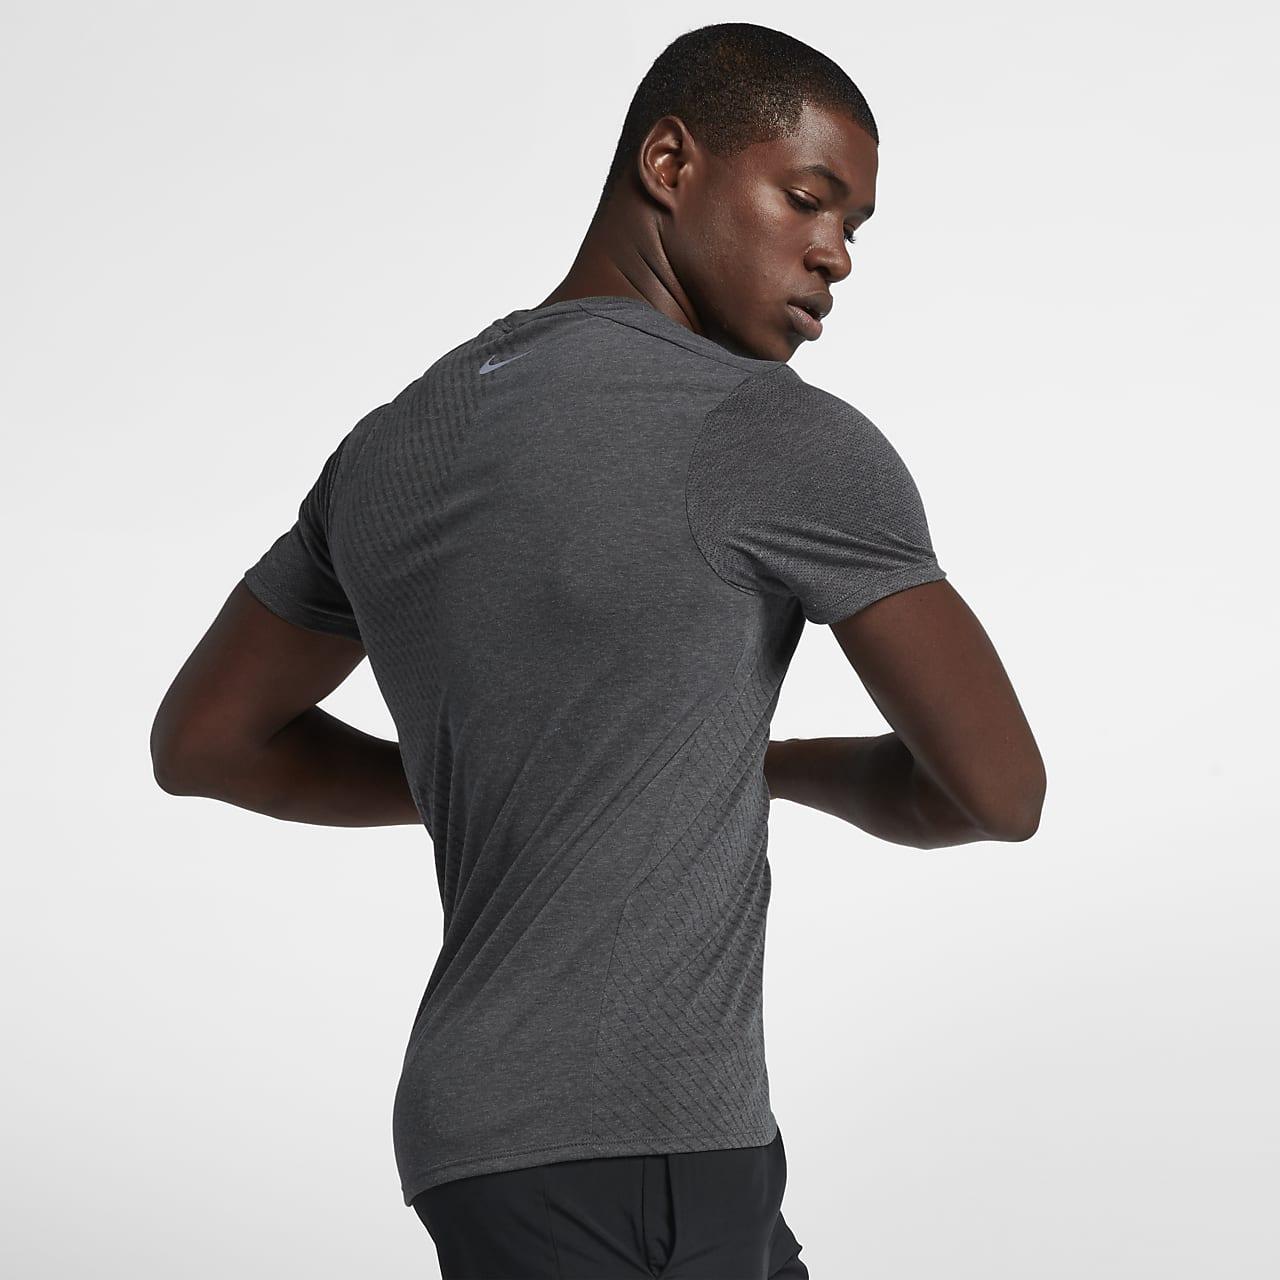 Nike Tailwind Men's Short-Sleeve Running Top